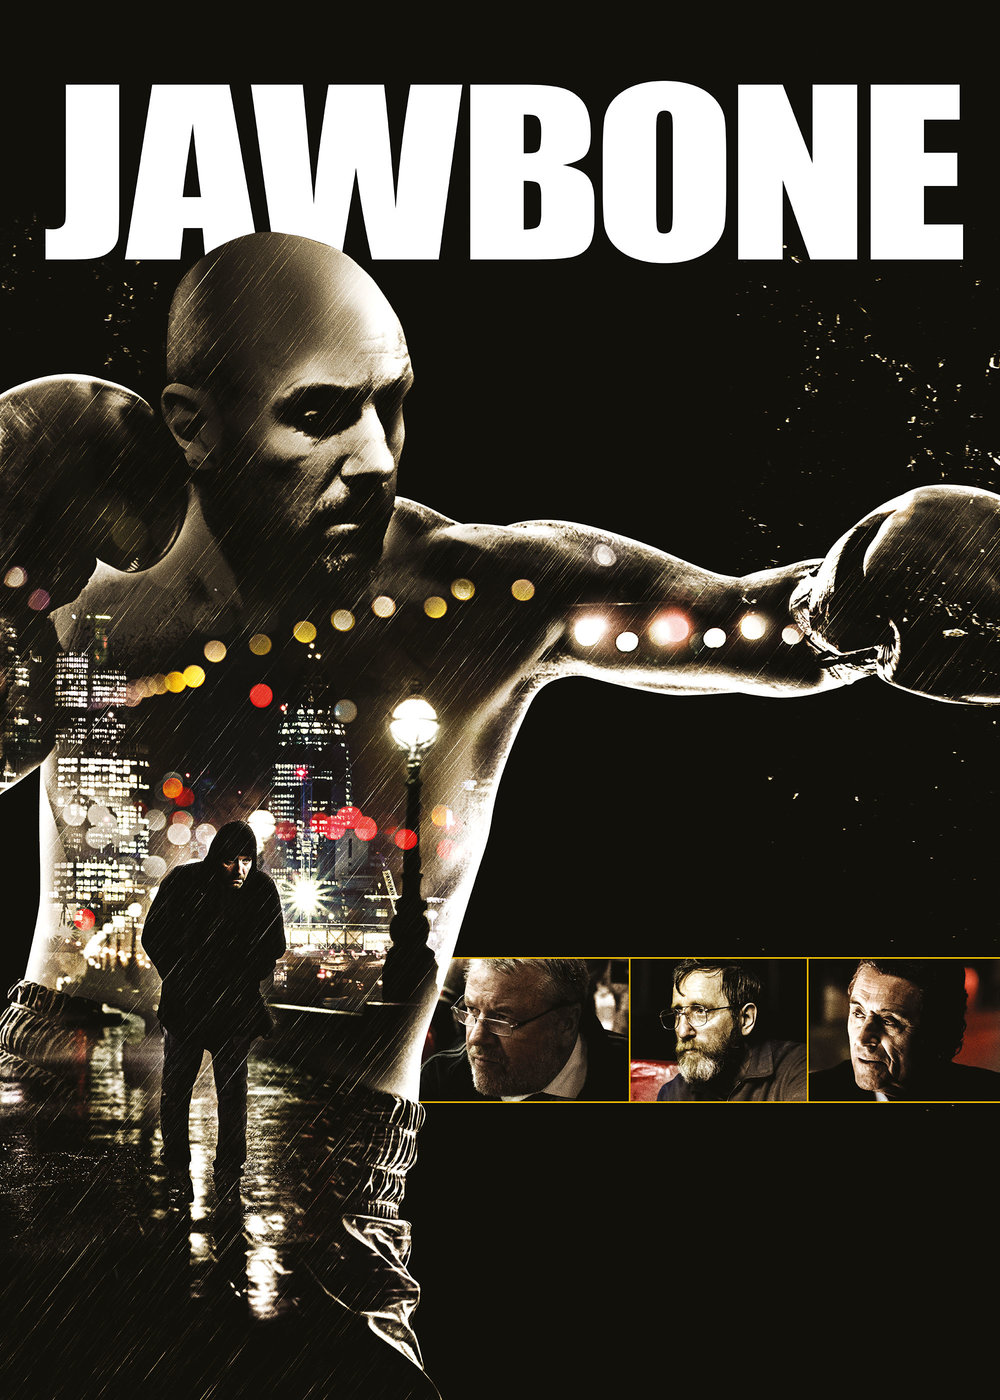 jawbone_poster.jpg